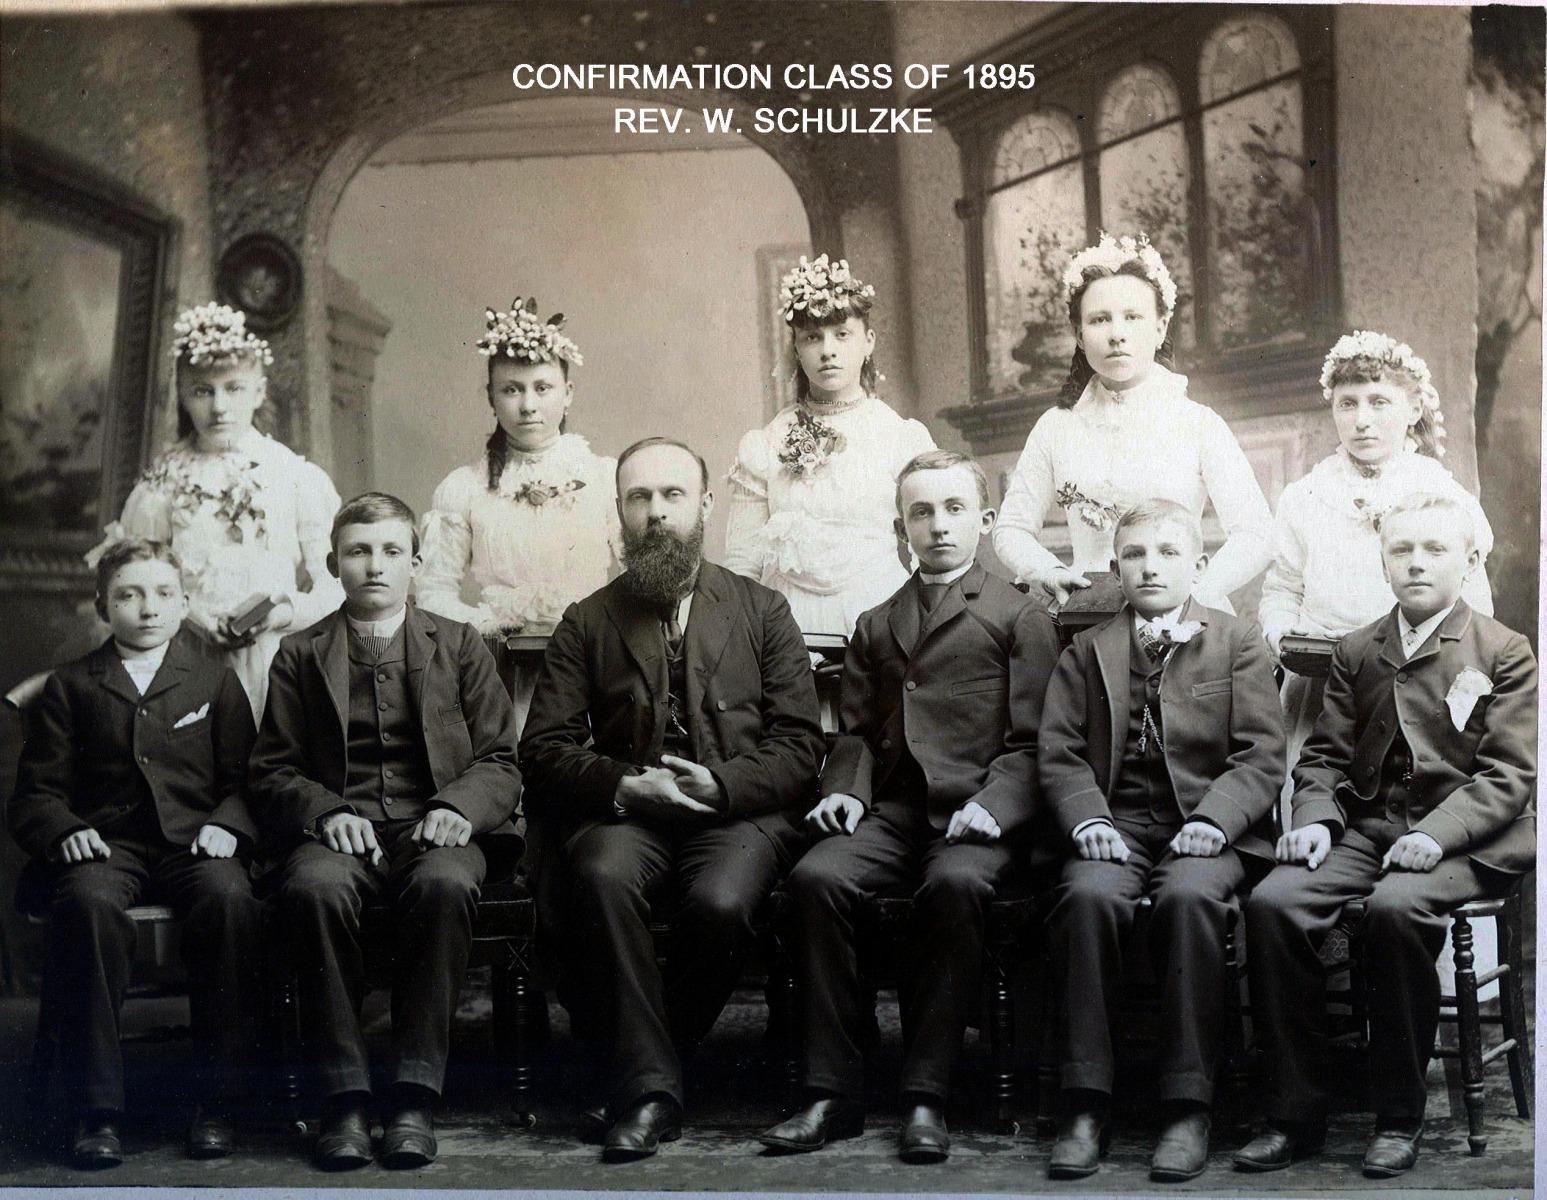 1895 CONFIRMATION CLASS001_1391464993025.jpg